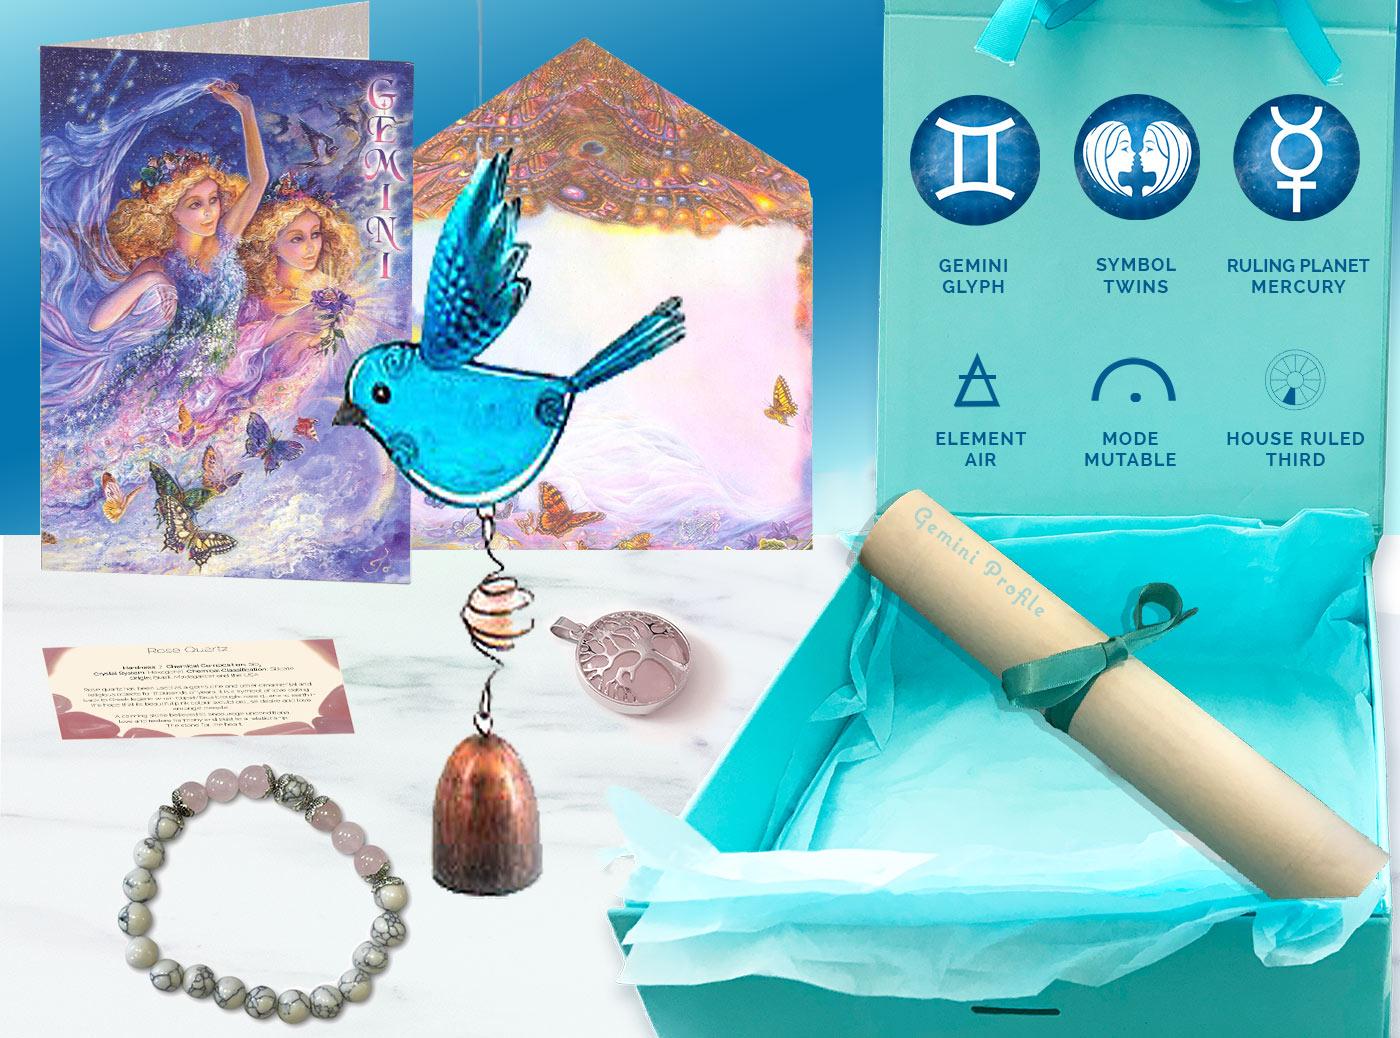 Gemini Gift Box and card